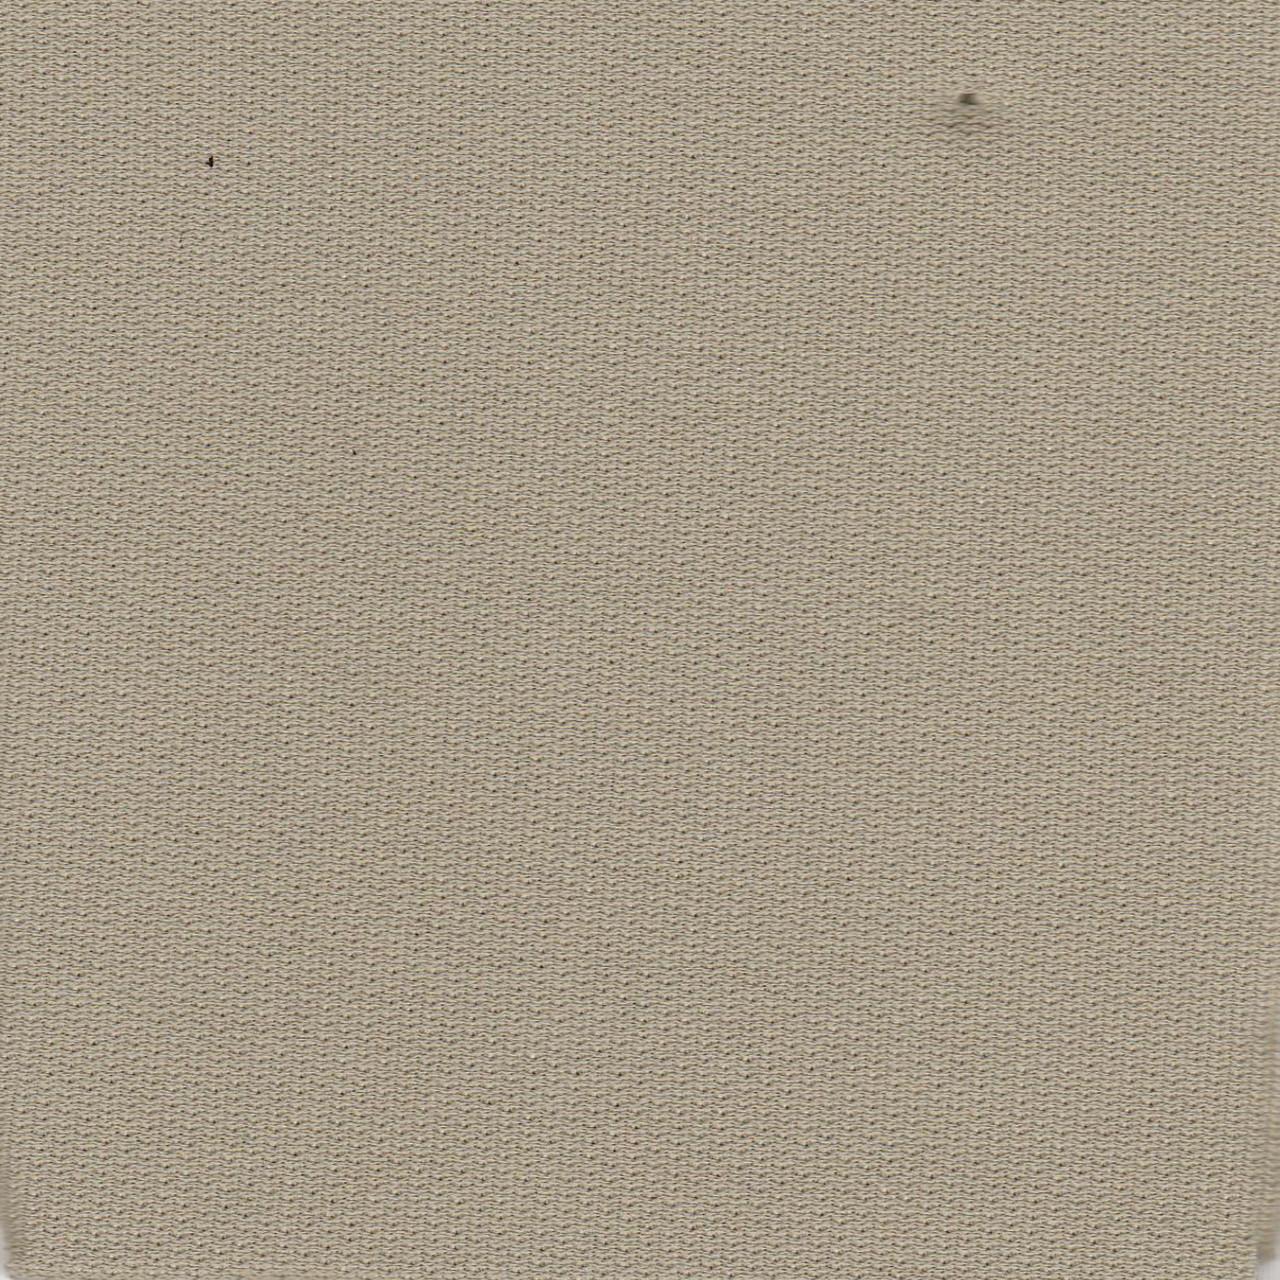 SunBrite SB-4220 Ivory